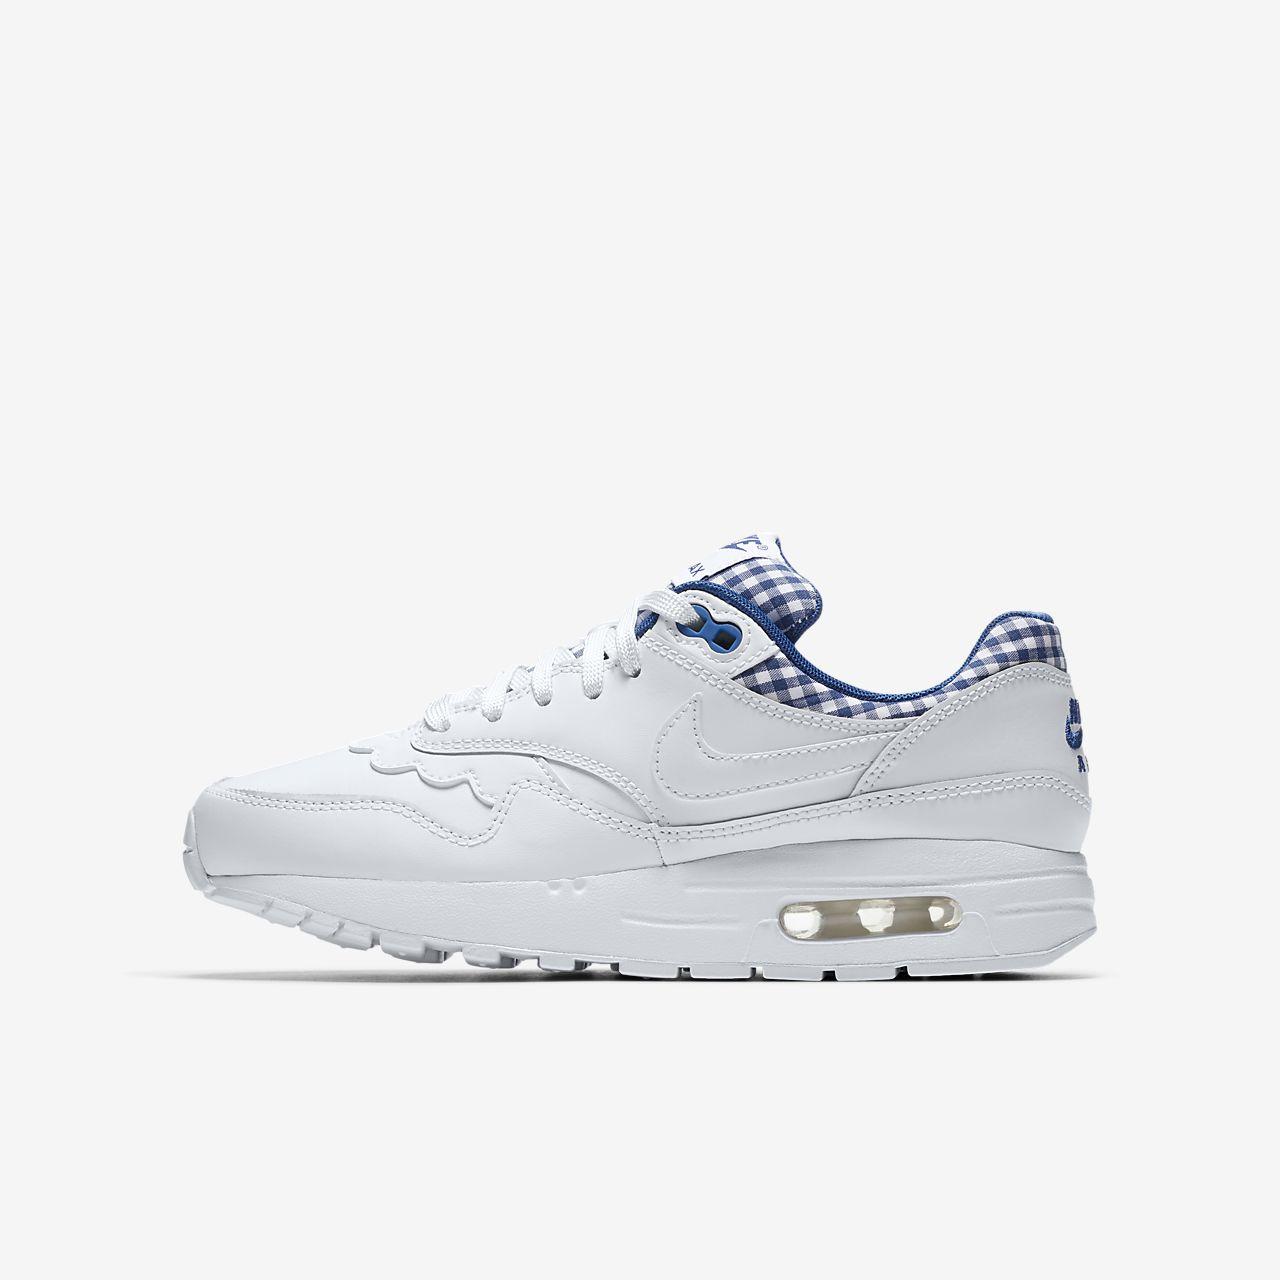 ... authentic nike air max 1 qs big kids shoe 2ad5a d7901 e0e1dc667